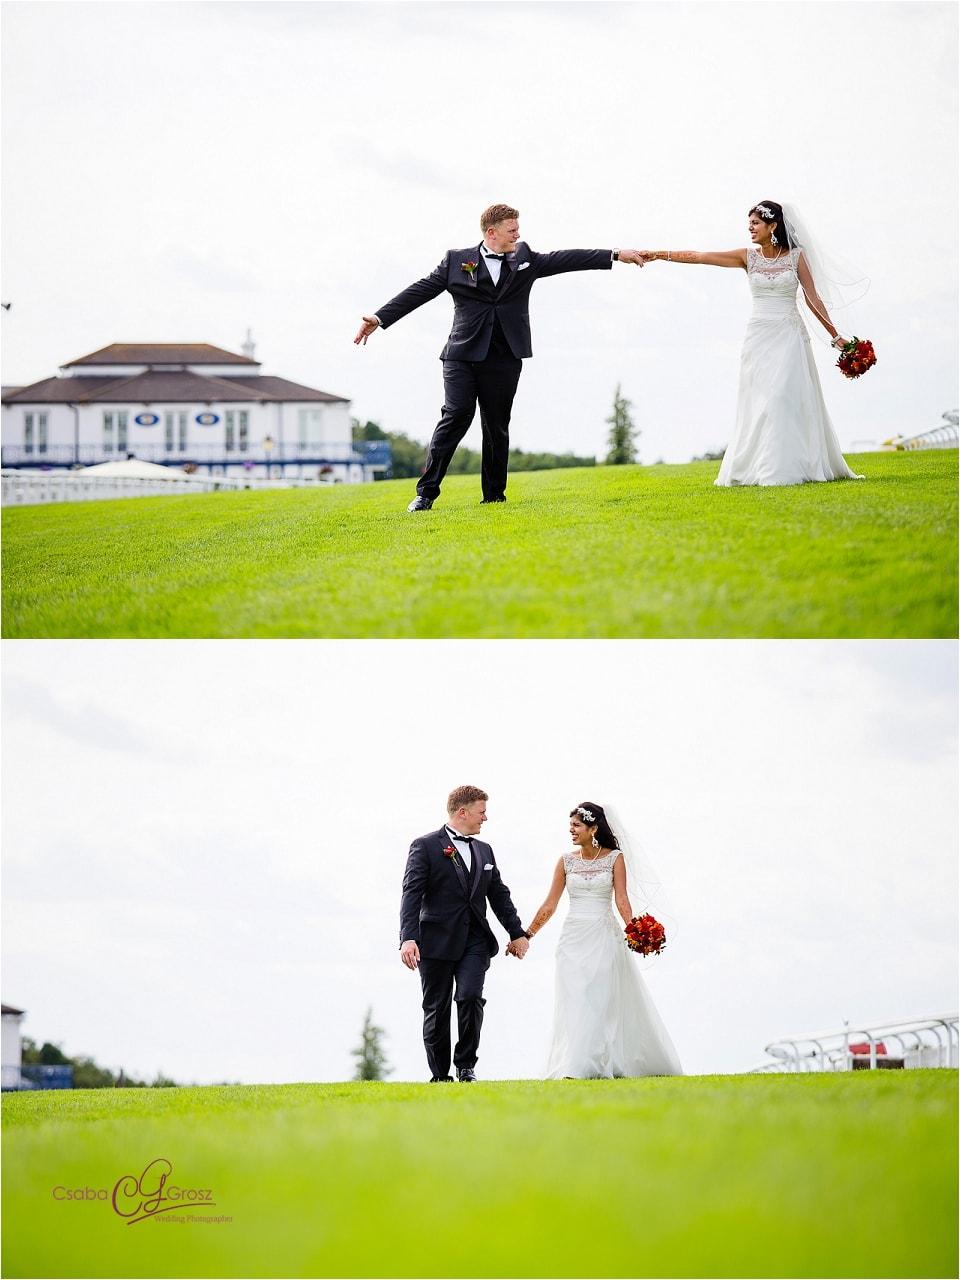 Parveen_Joseph_Wedding_at_Epsom_Downs_Wedding_Photographer_16